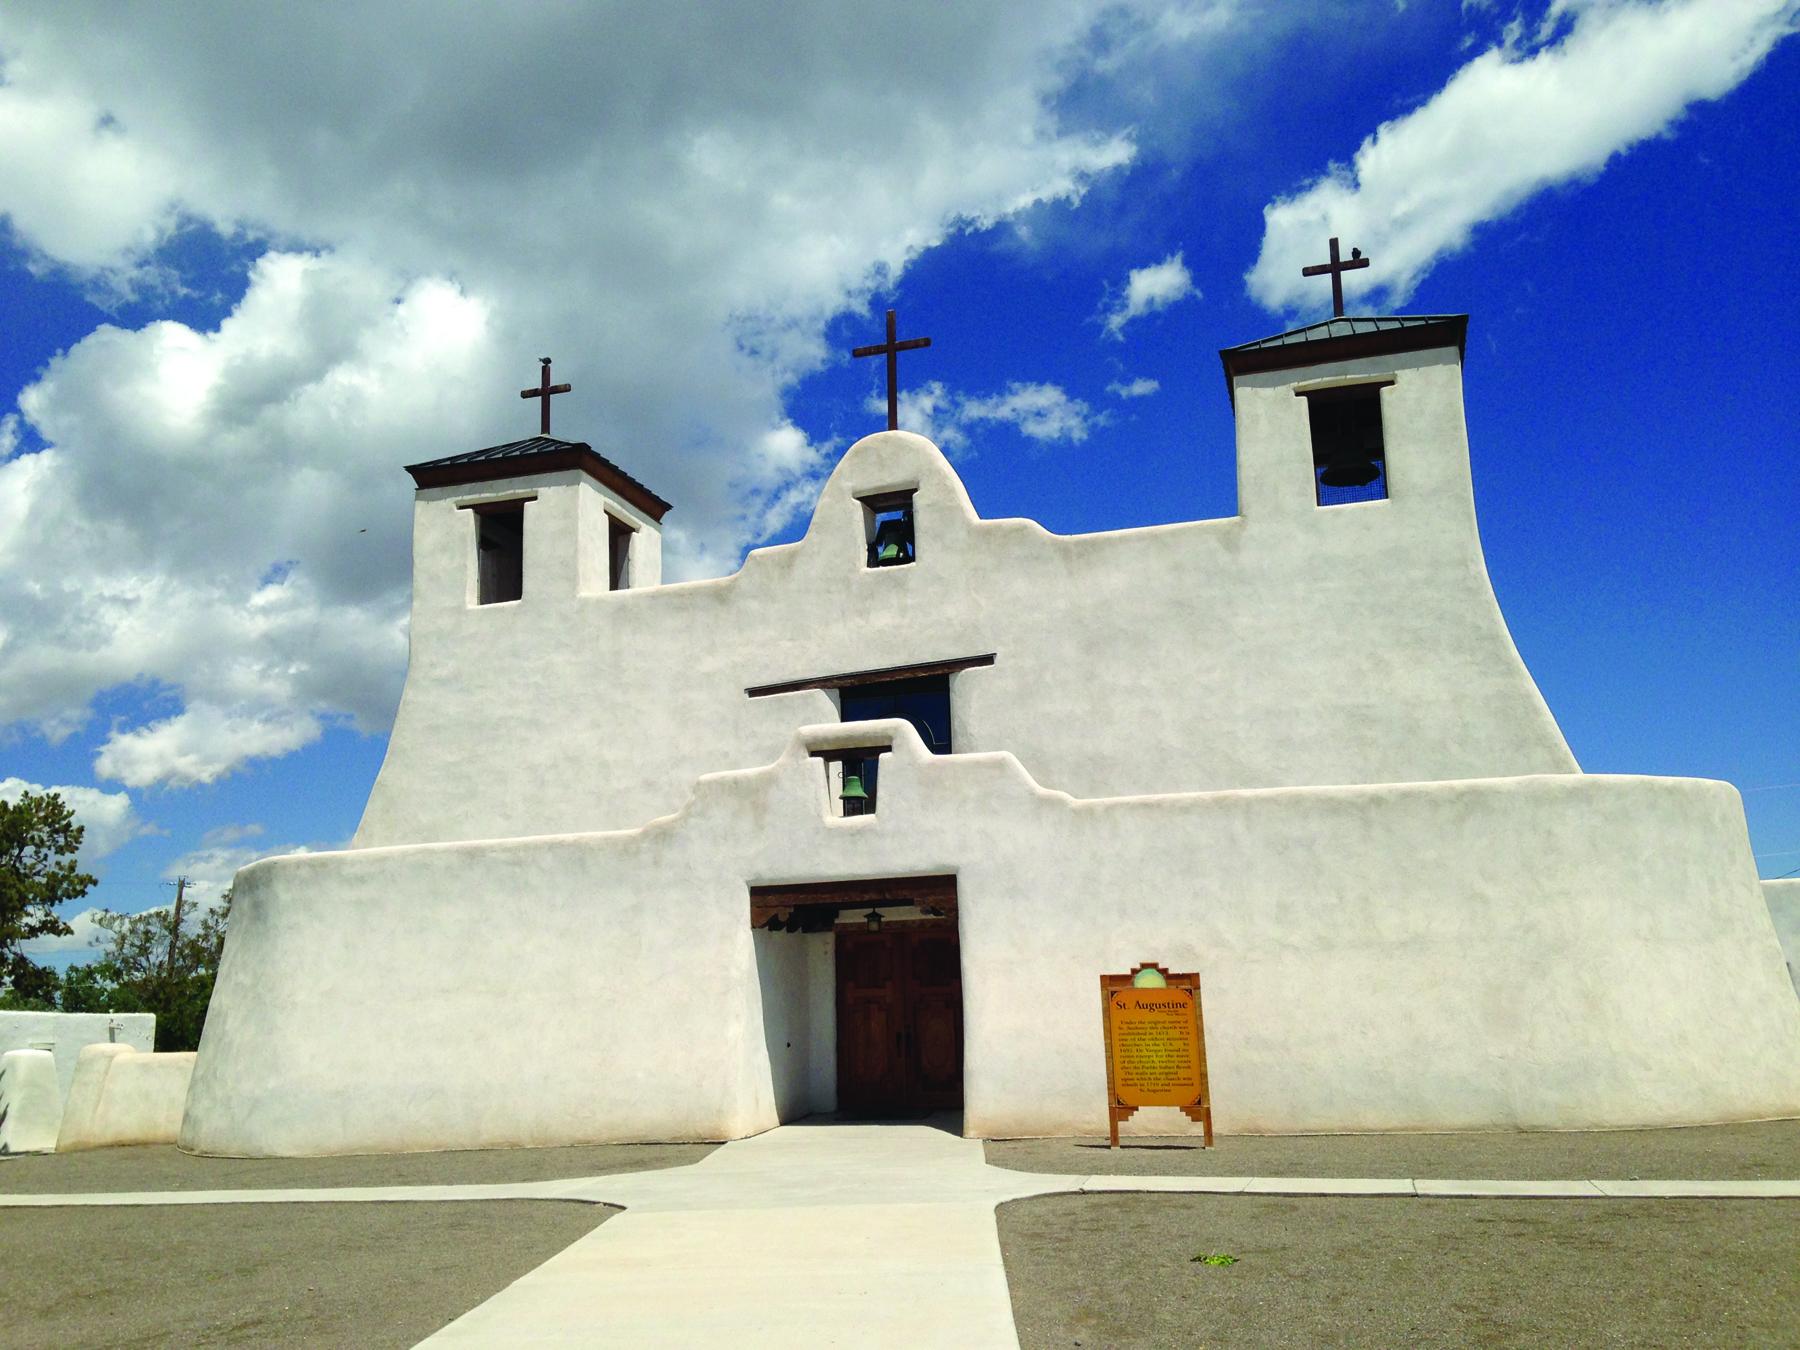 St. Augustine Mission in Isleta